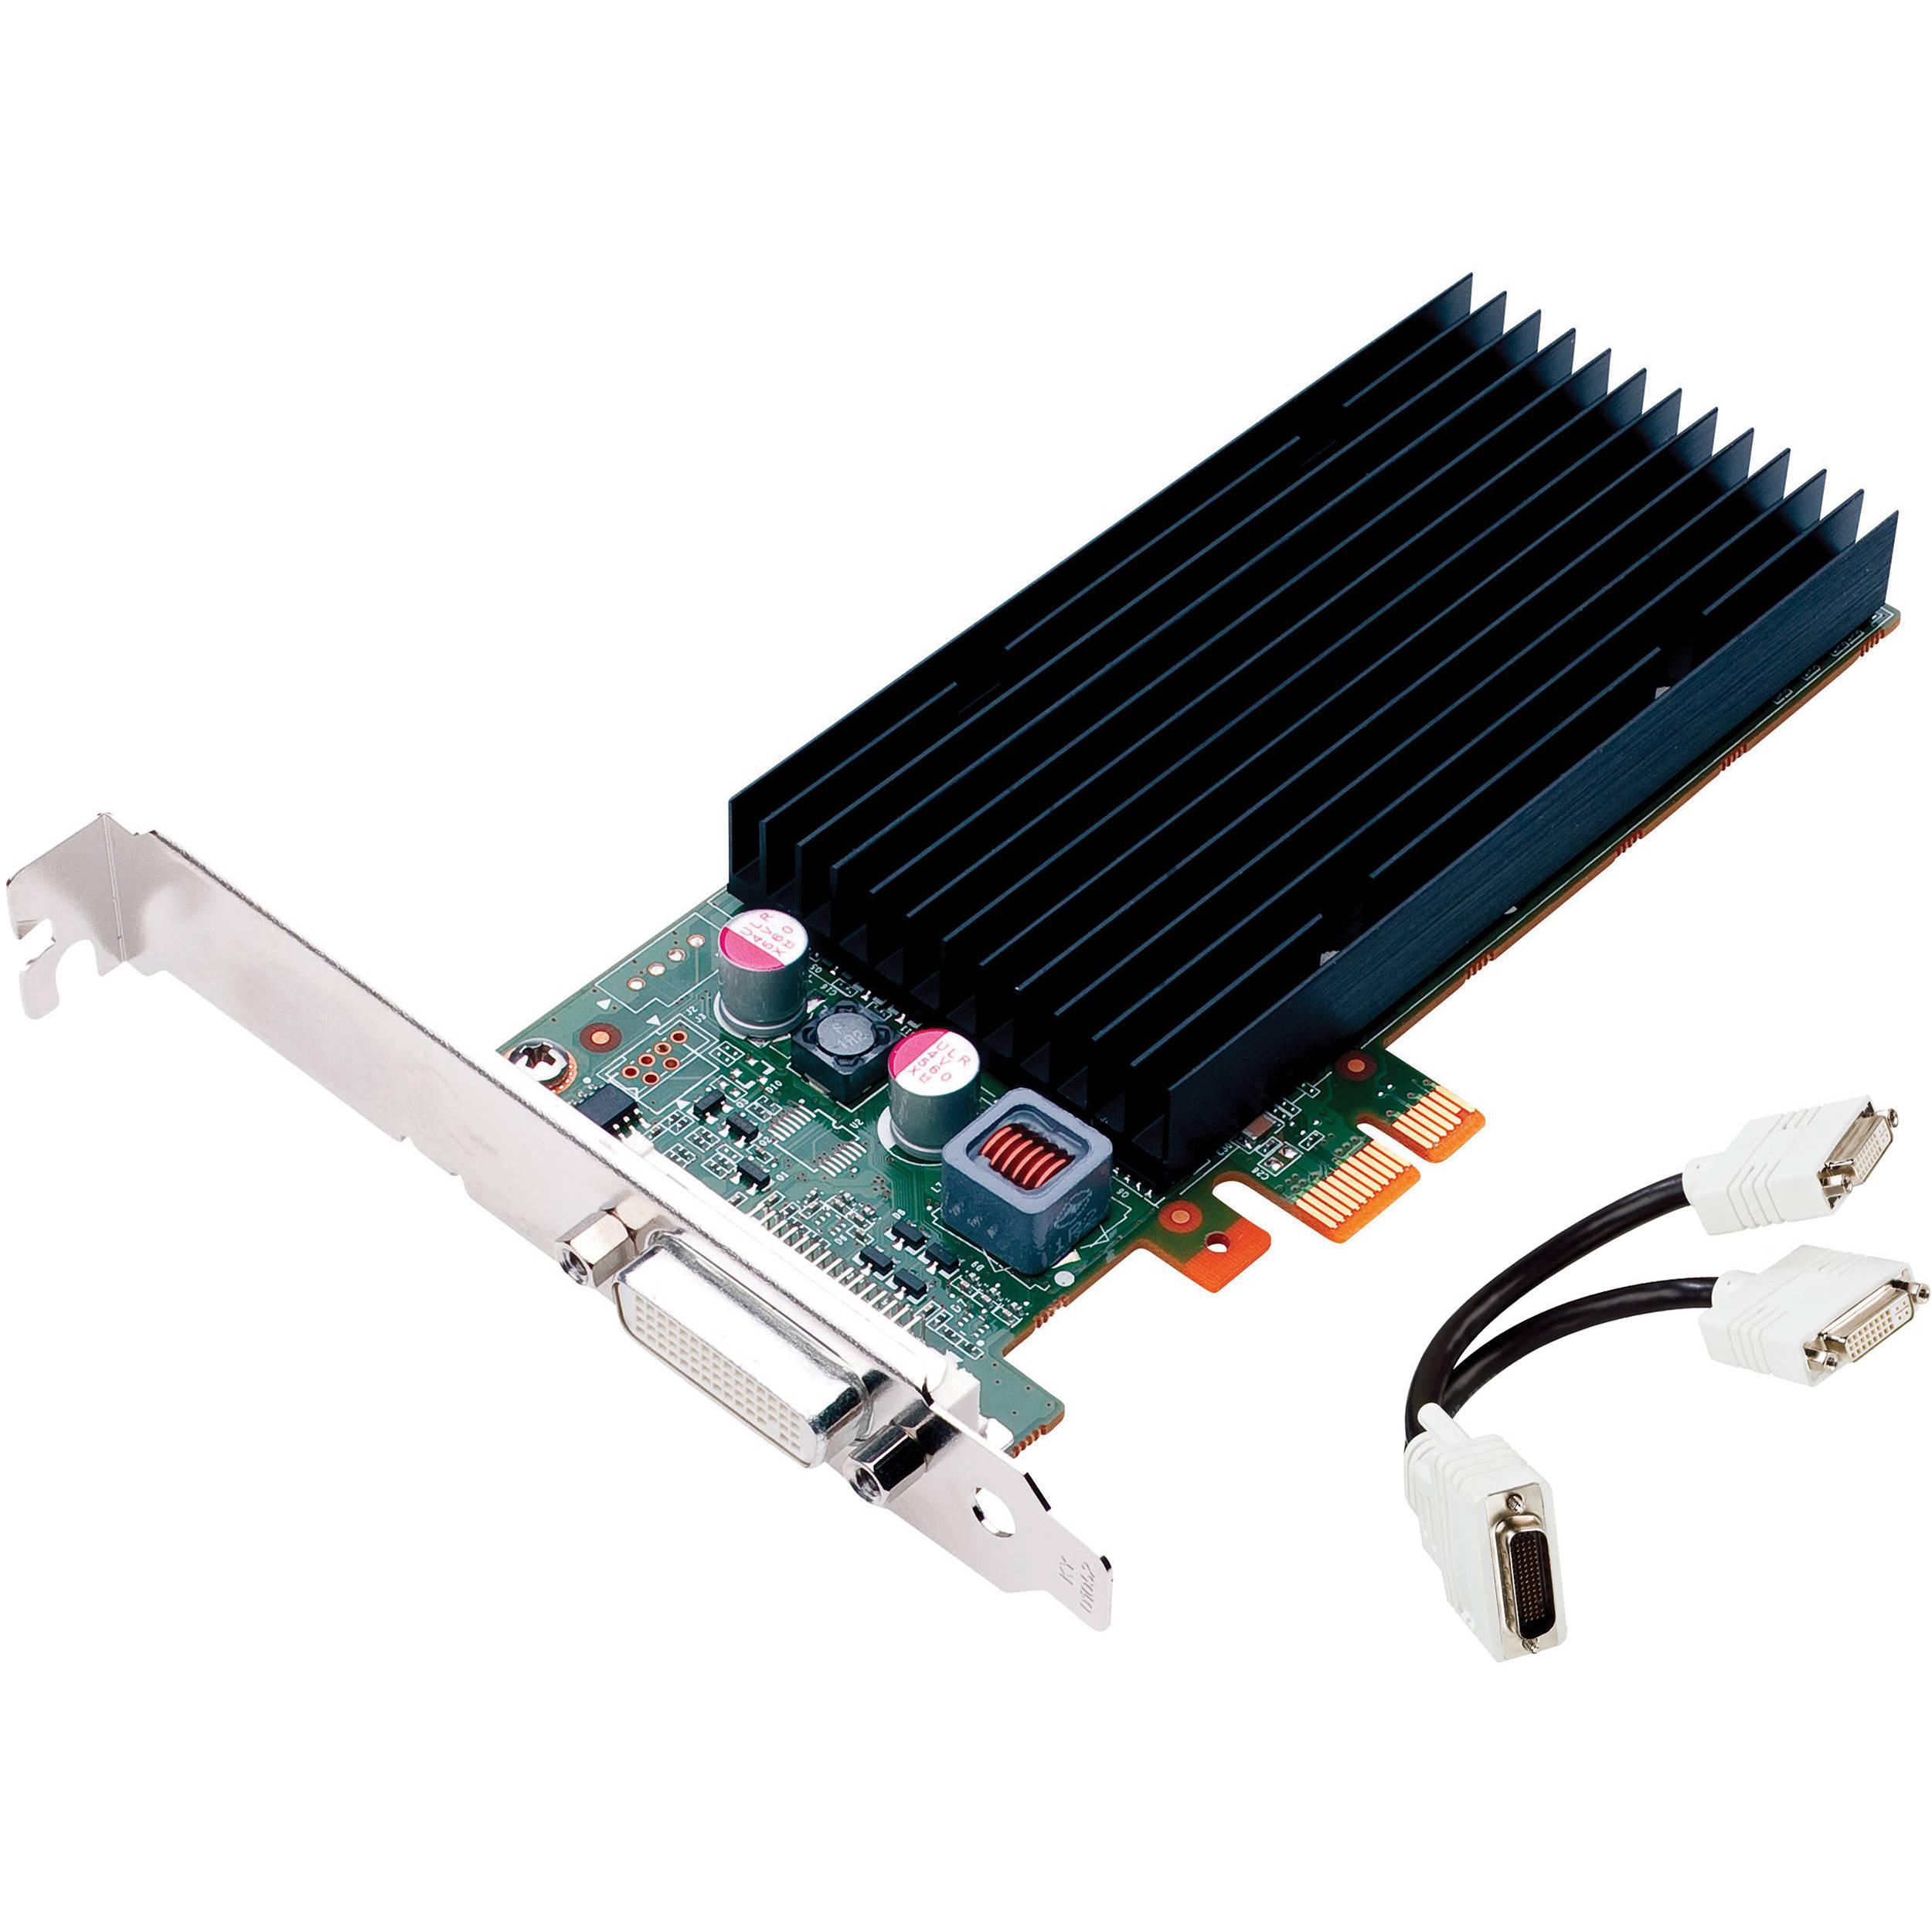 PNY Technologies nVIDIA NVS 300 x16 for DVI and VCNVS300X16-PB